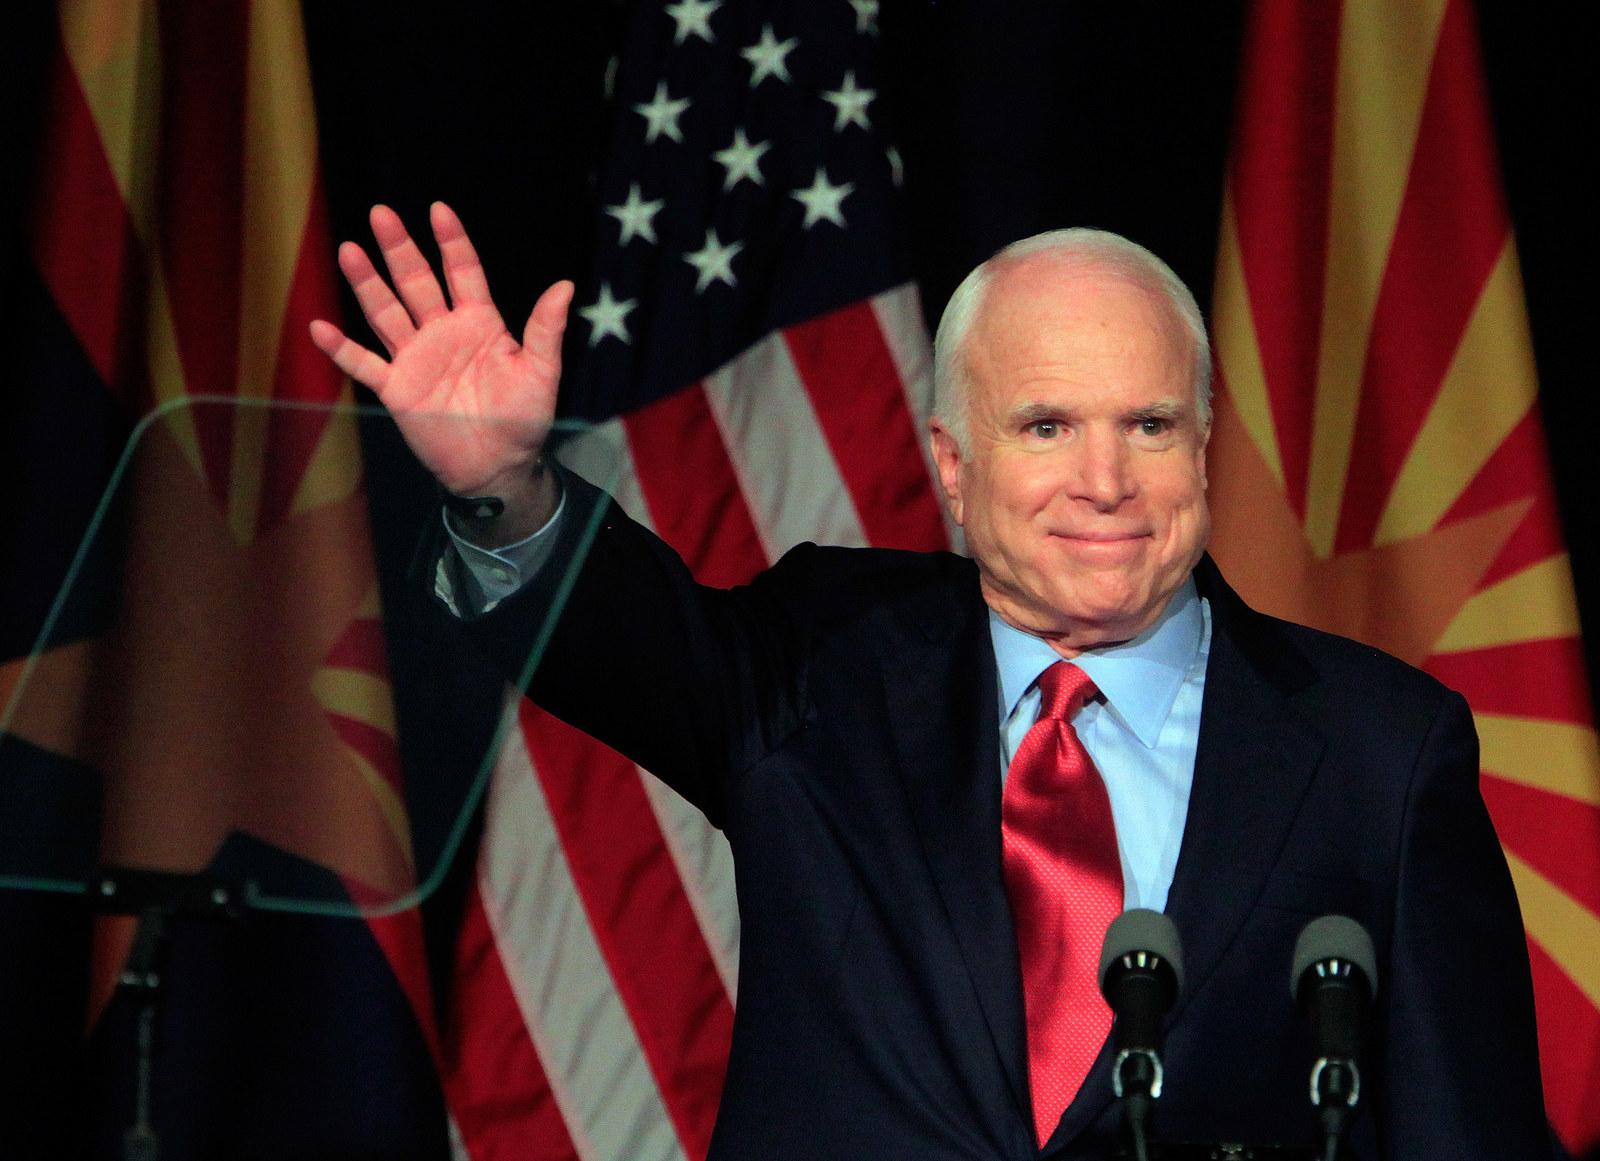 John McCain Was Farewelled At An Emotional Funeral At Washington National Cathedral